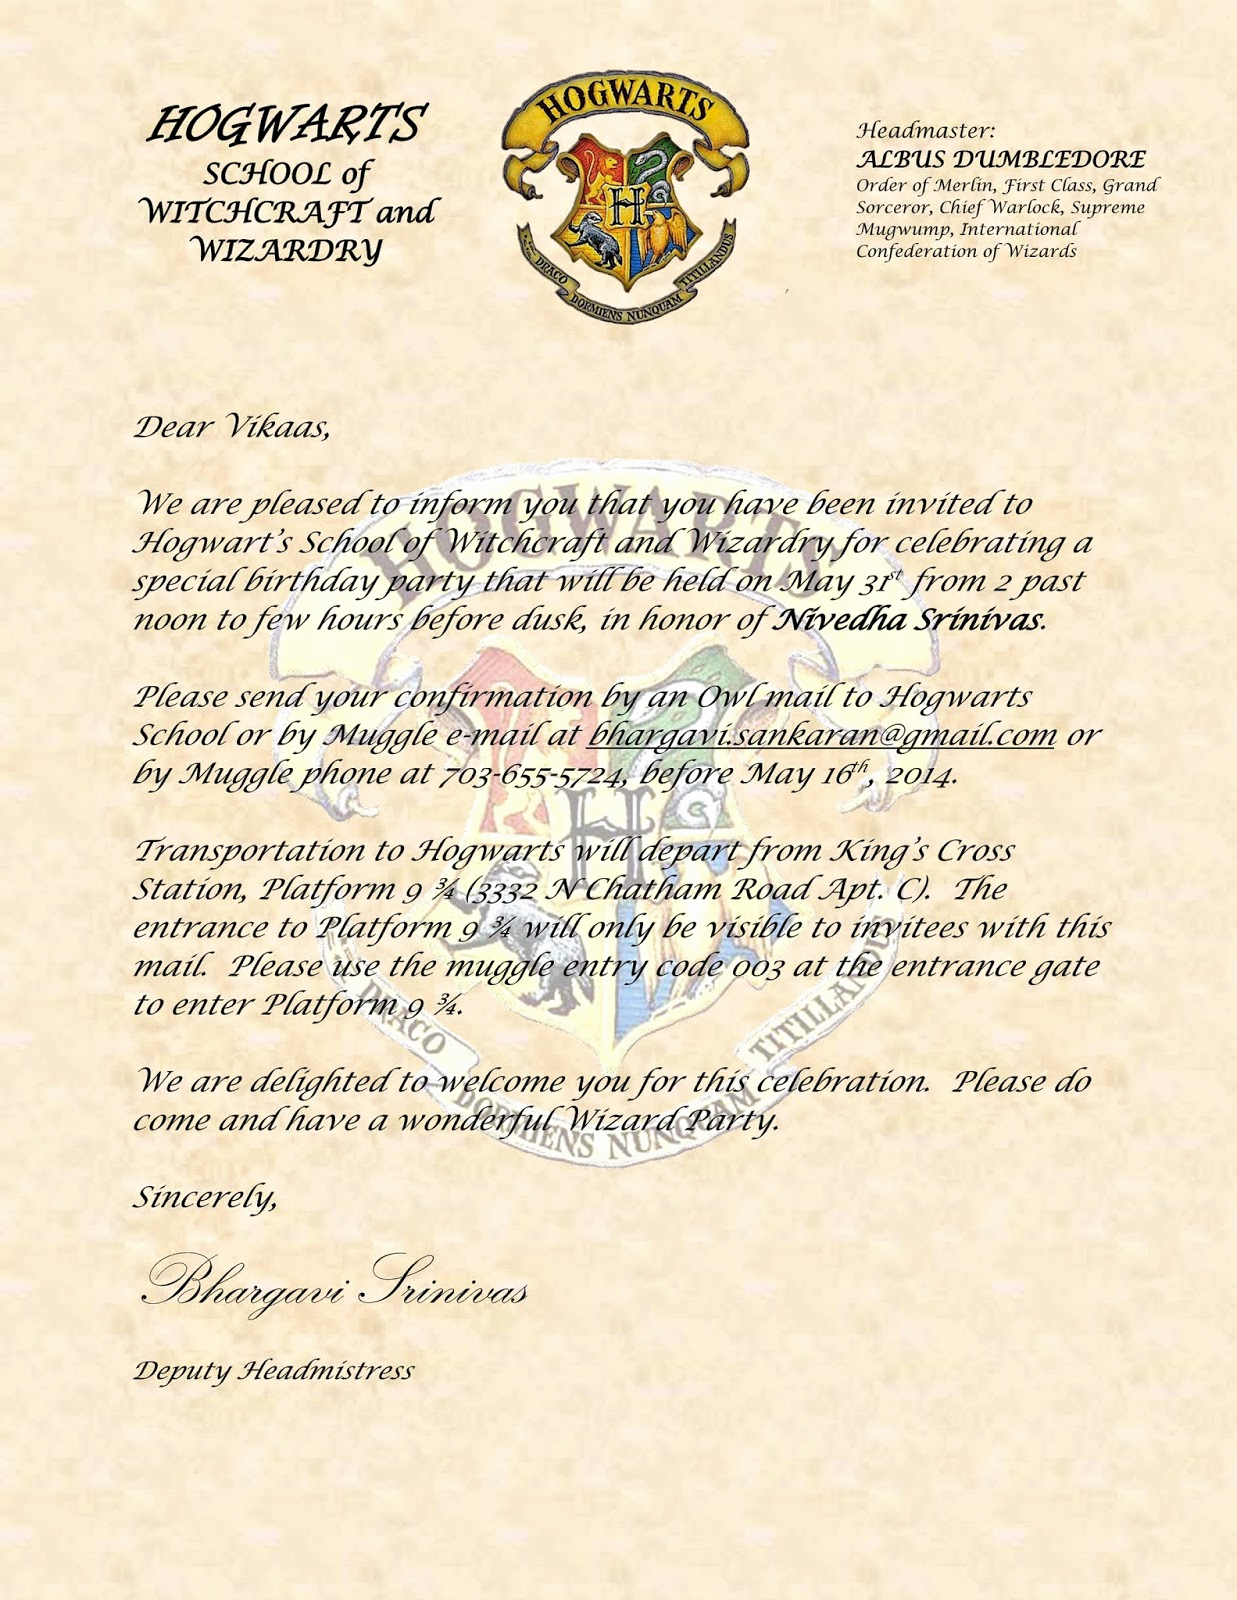 Harry Potter Hogwarts Invitation Lovely Sbnv Our World Harry Potter Birthday Party